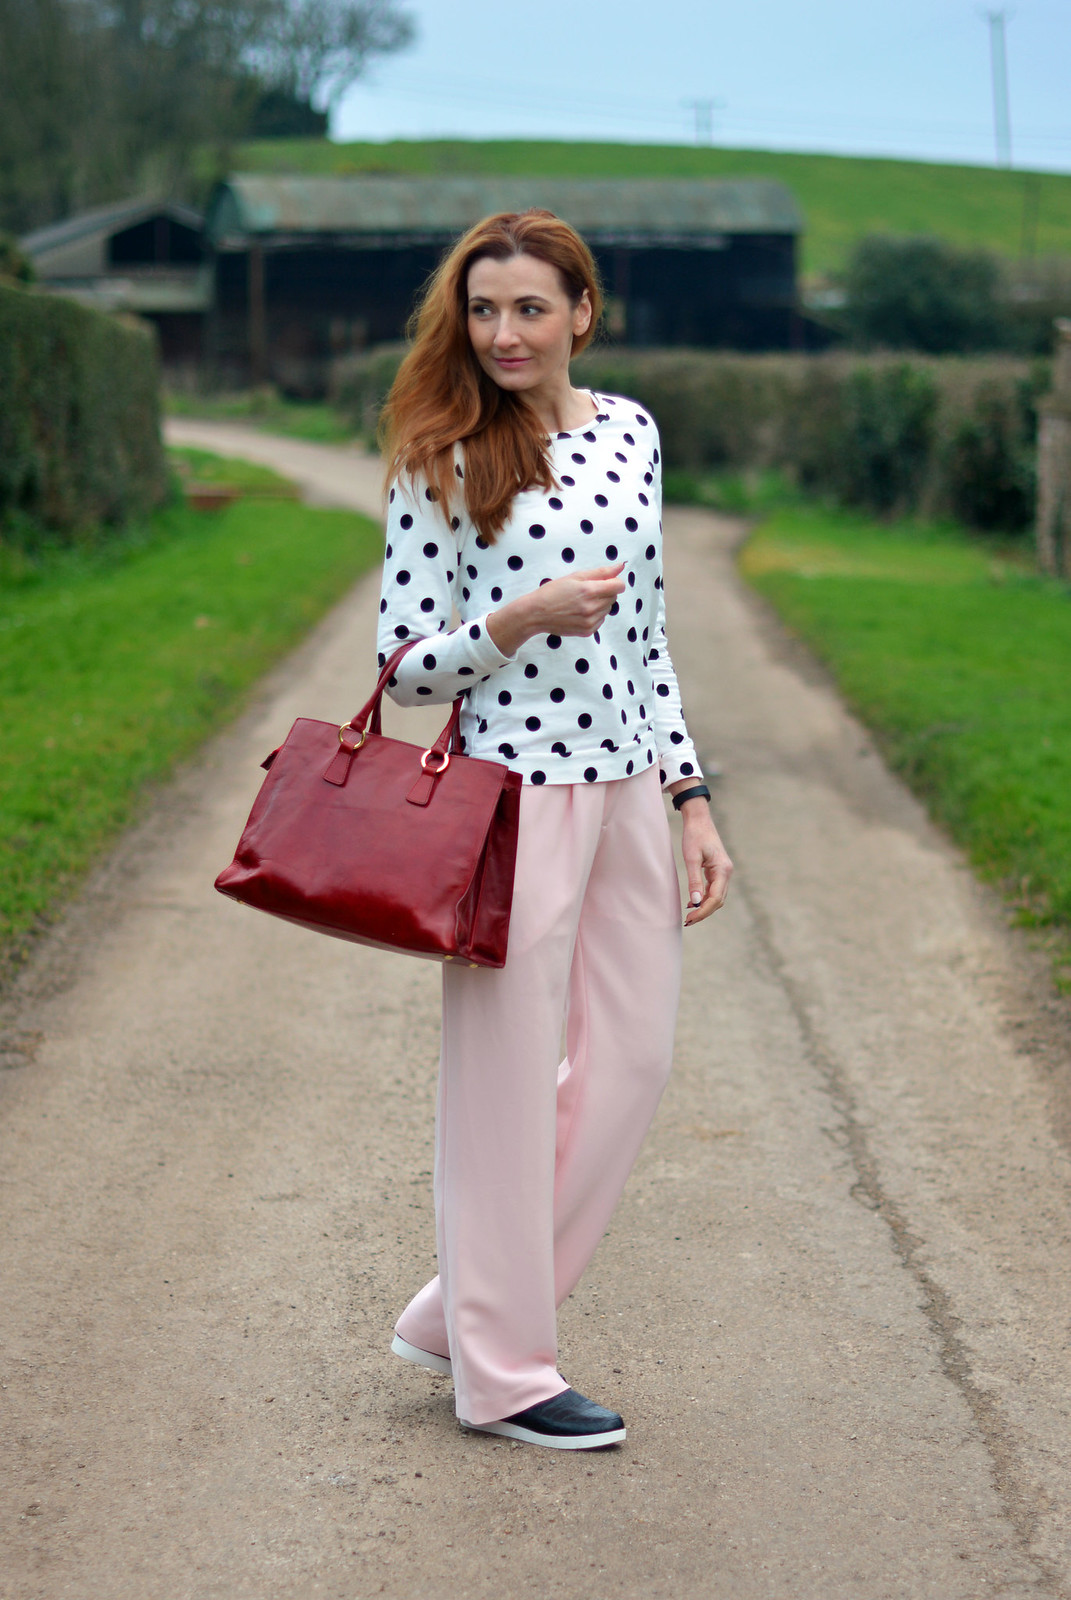 Black & white polka dot sweatshirt, pastel pink wide legged trousers, black slip on sneakers, cherry red tote